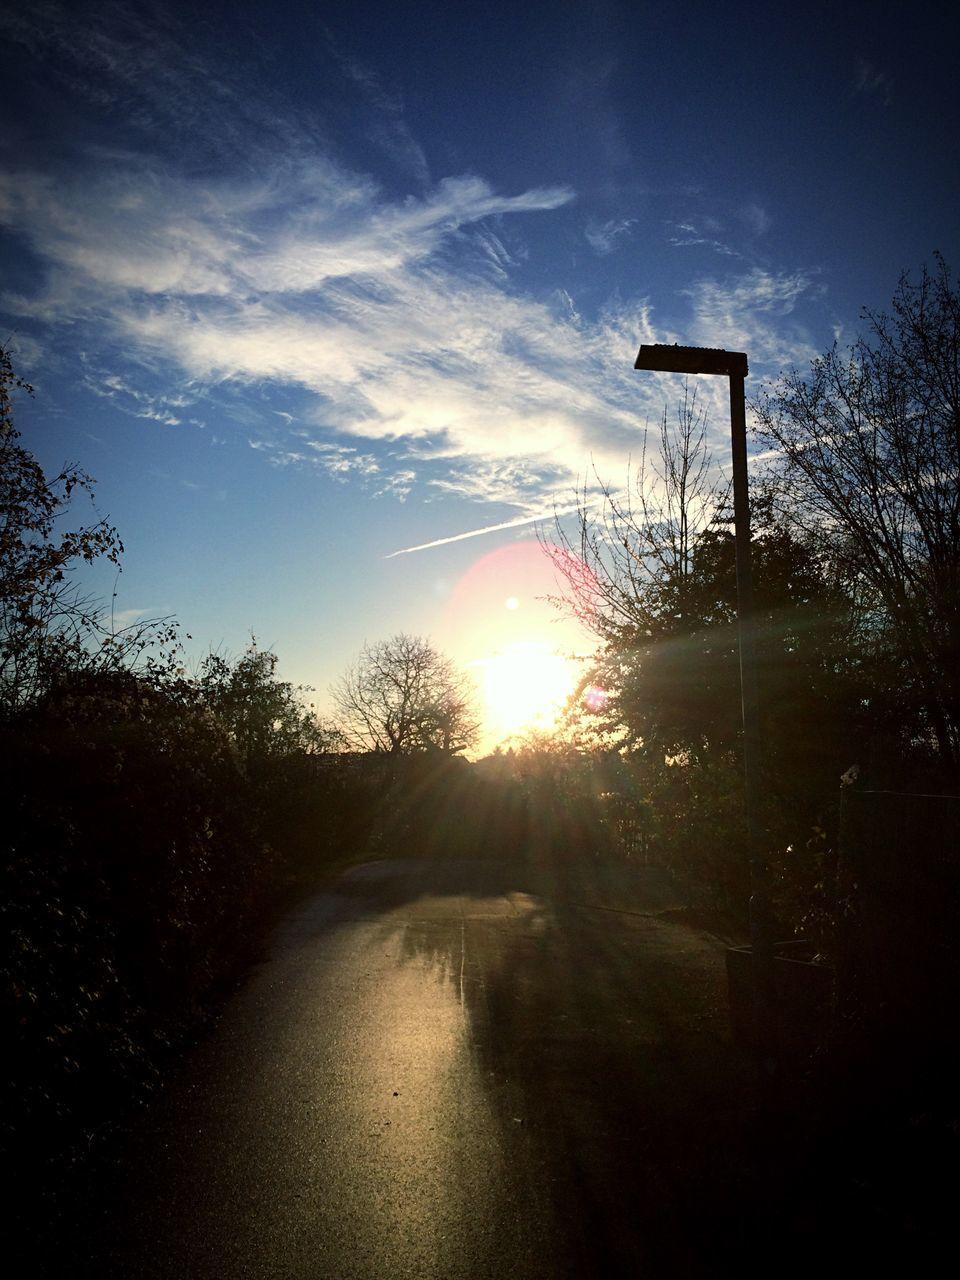 sunset, sunbeam, sunlight, silhouette, tree, sport, basketball hoop, sky, basketball - sport, sun, outdoors, nature, no people, scenics, day, court, beauty in nature